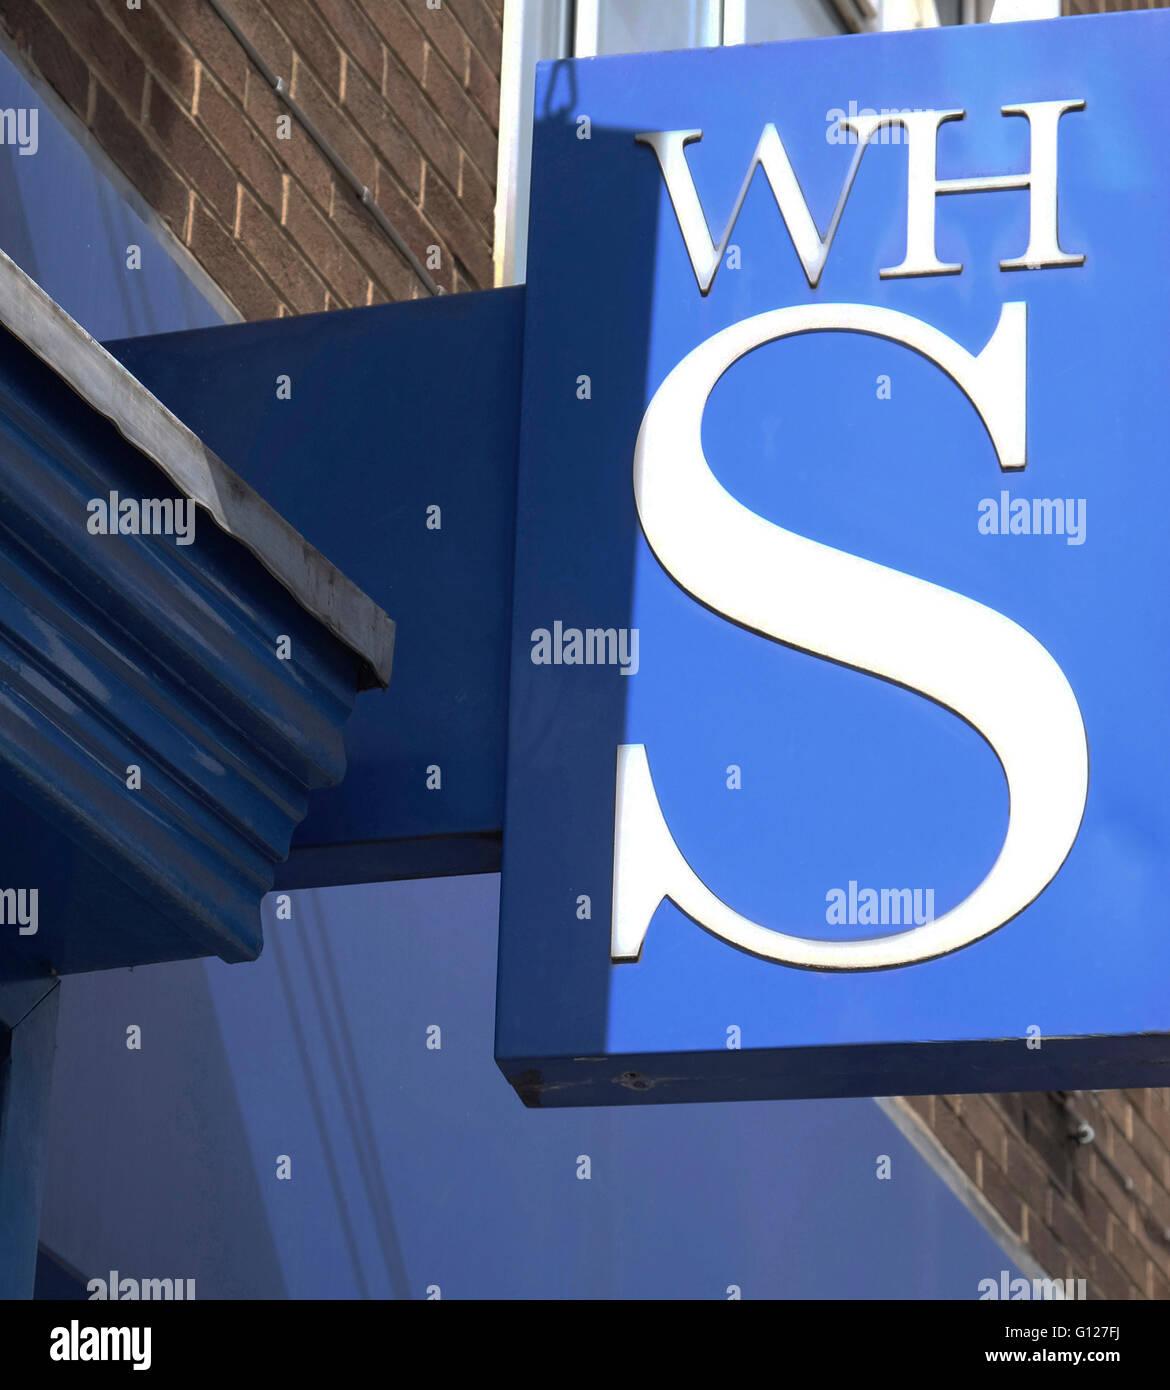 WHSmiths wall logo, High Street, Grantham, Lincolnshire - Stock Image